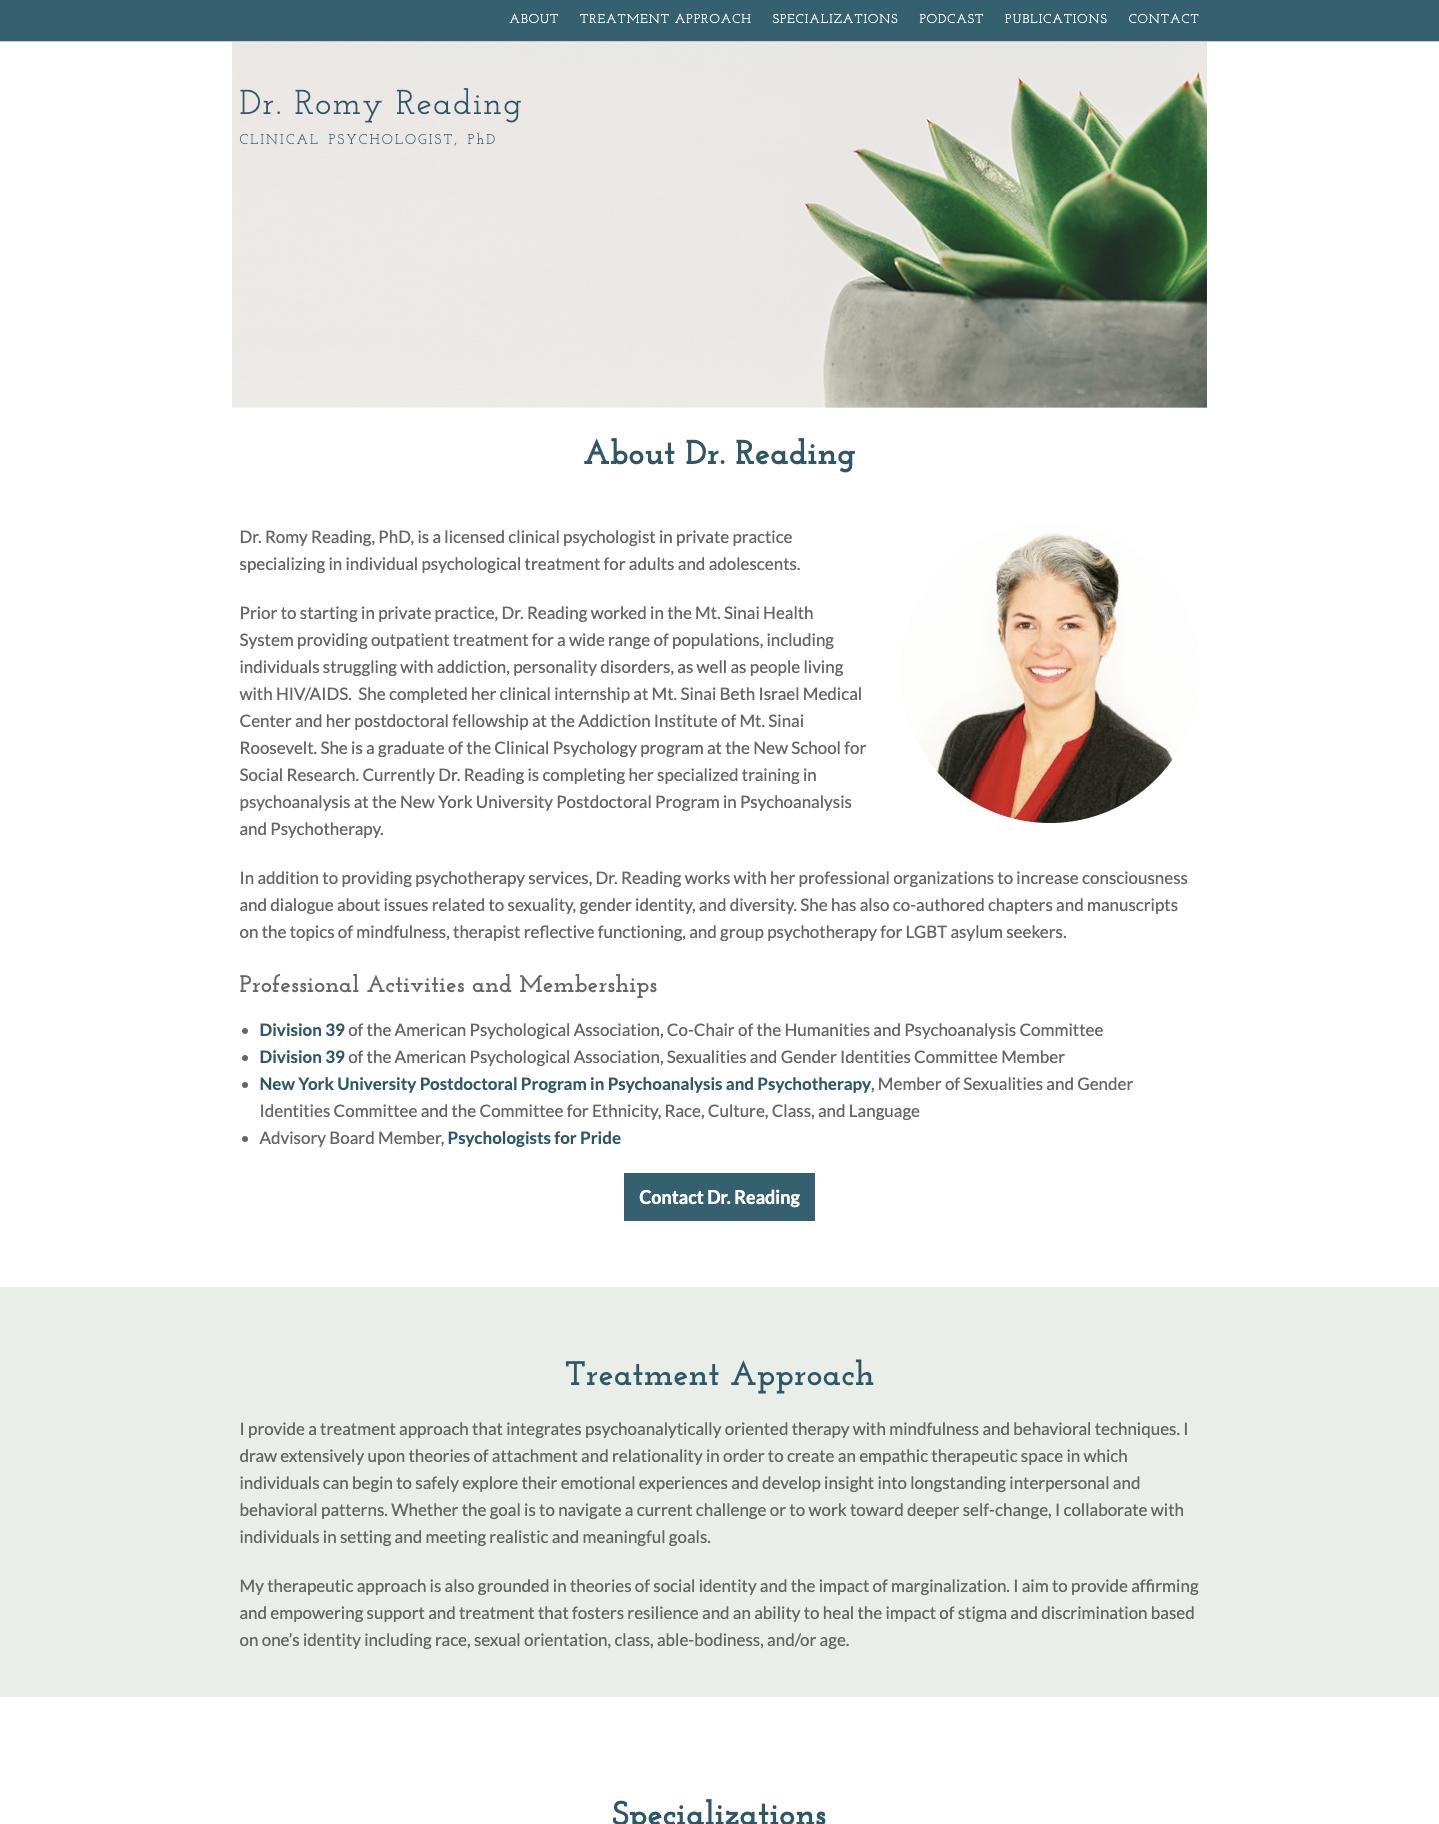 Psychologist, professional website